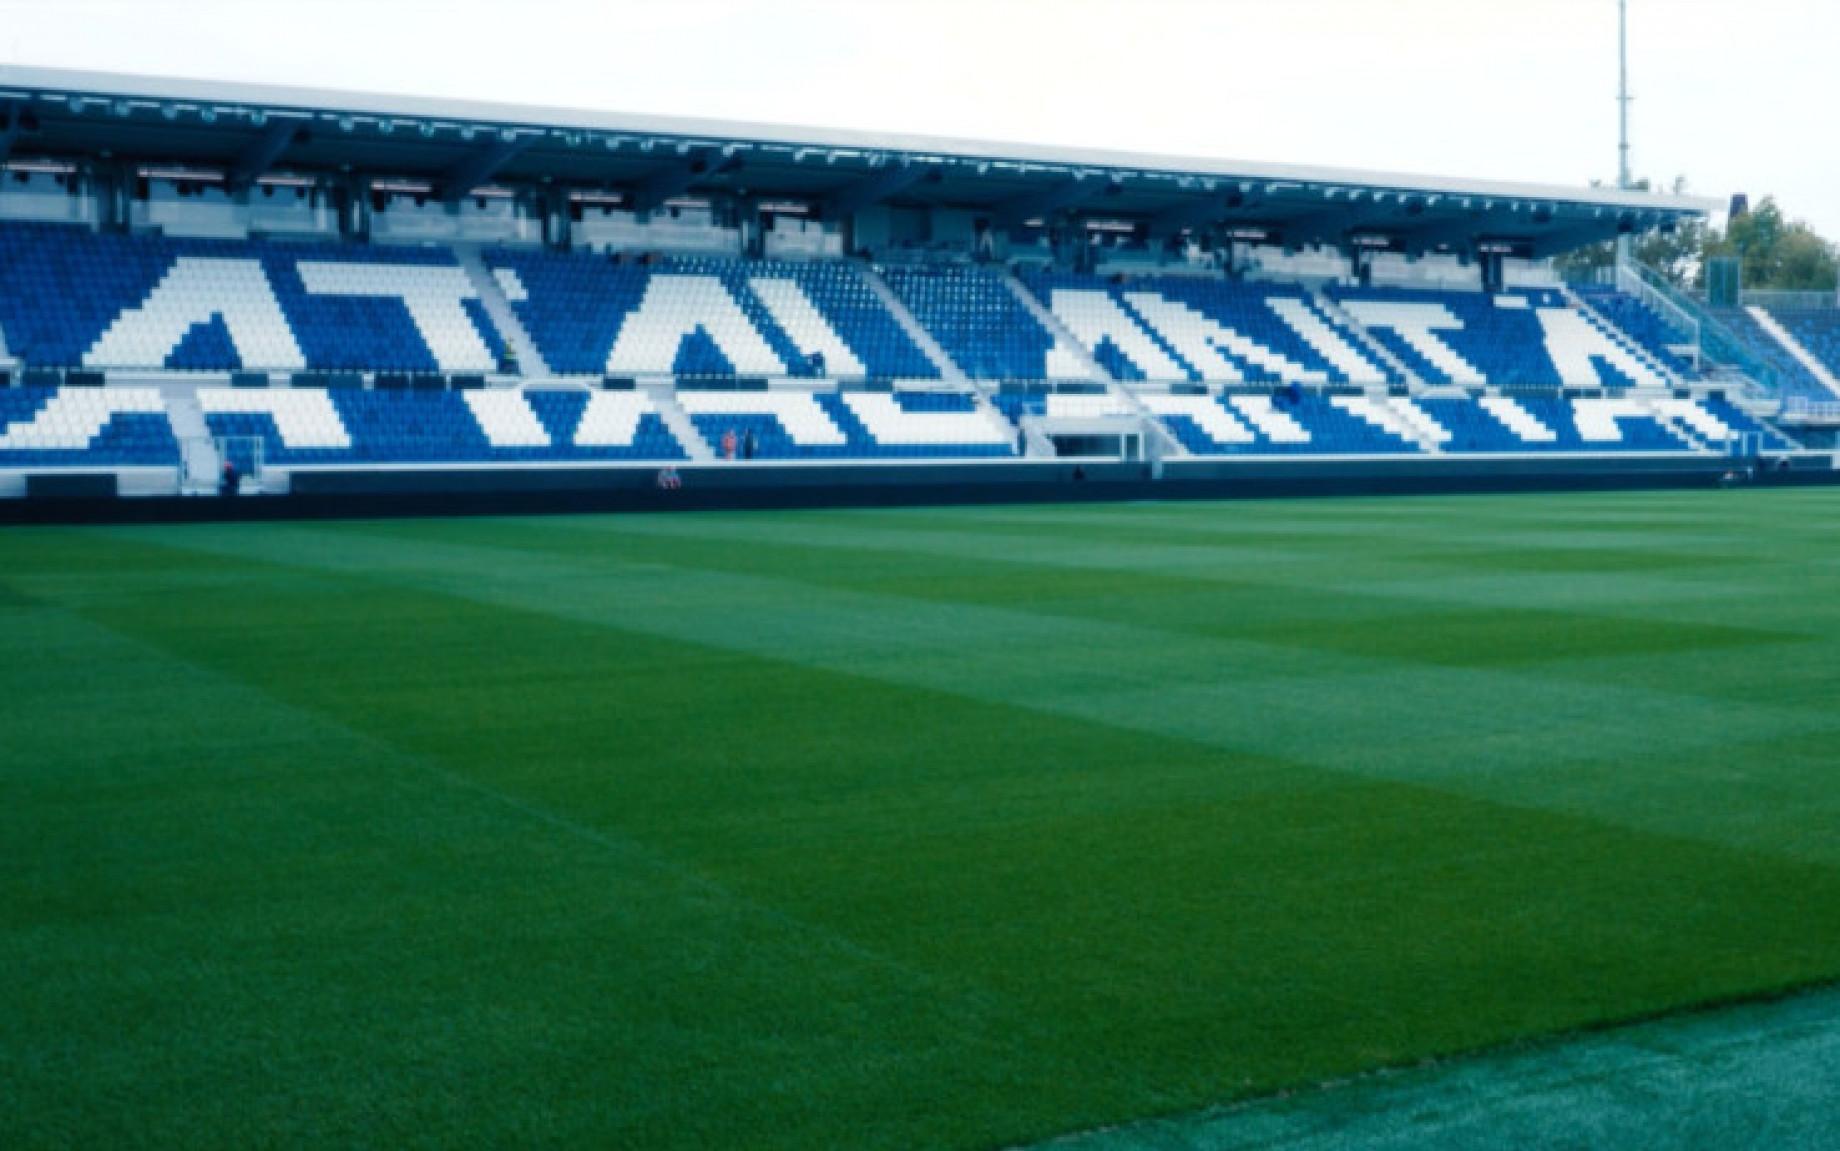 atalanta_stadio_gewiss_stadium_screen_gdm.jpg